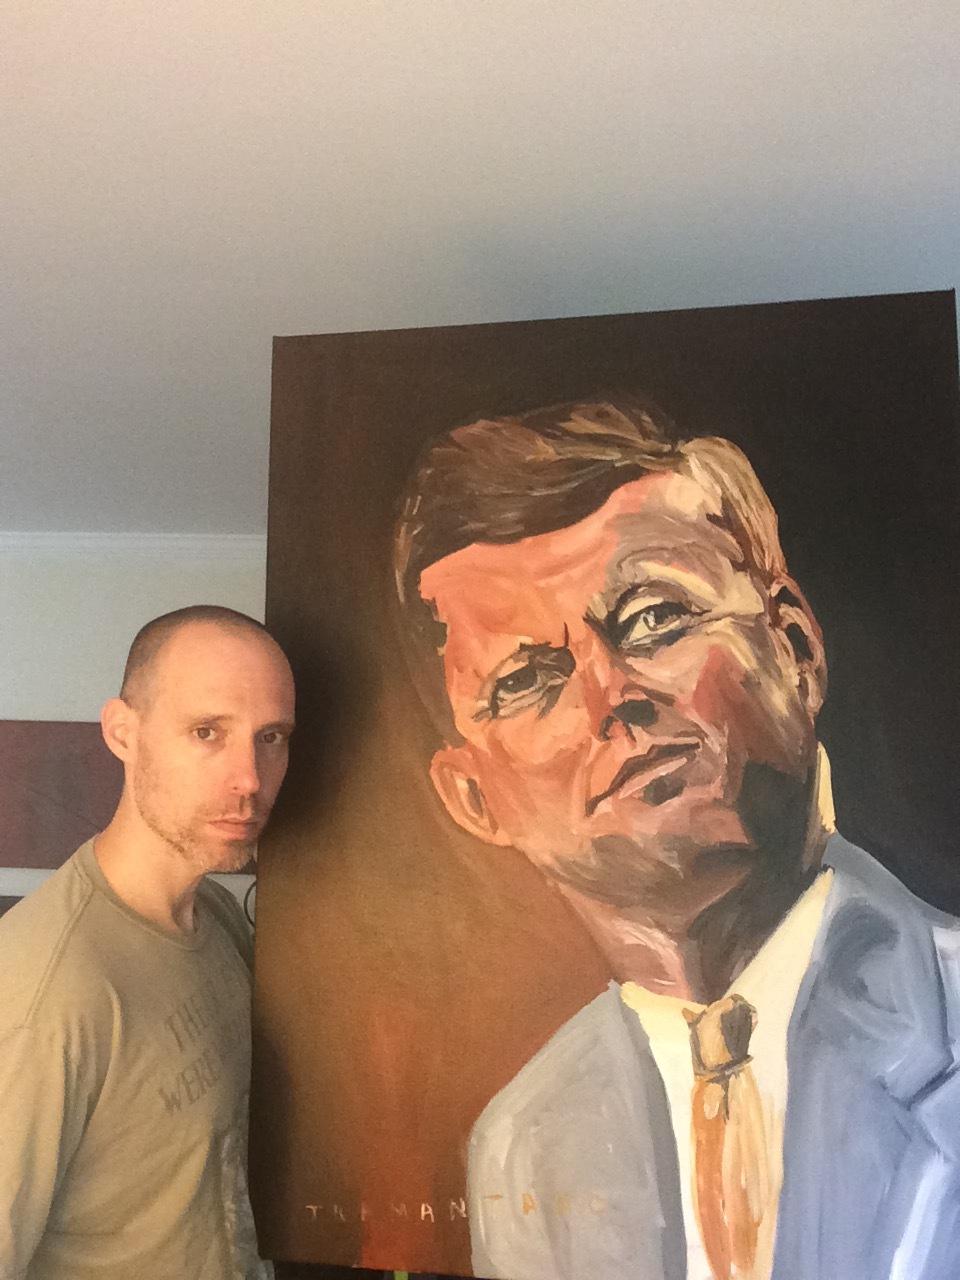 PaintingofJFK